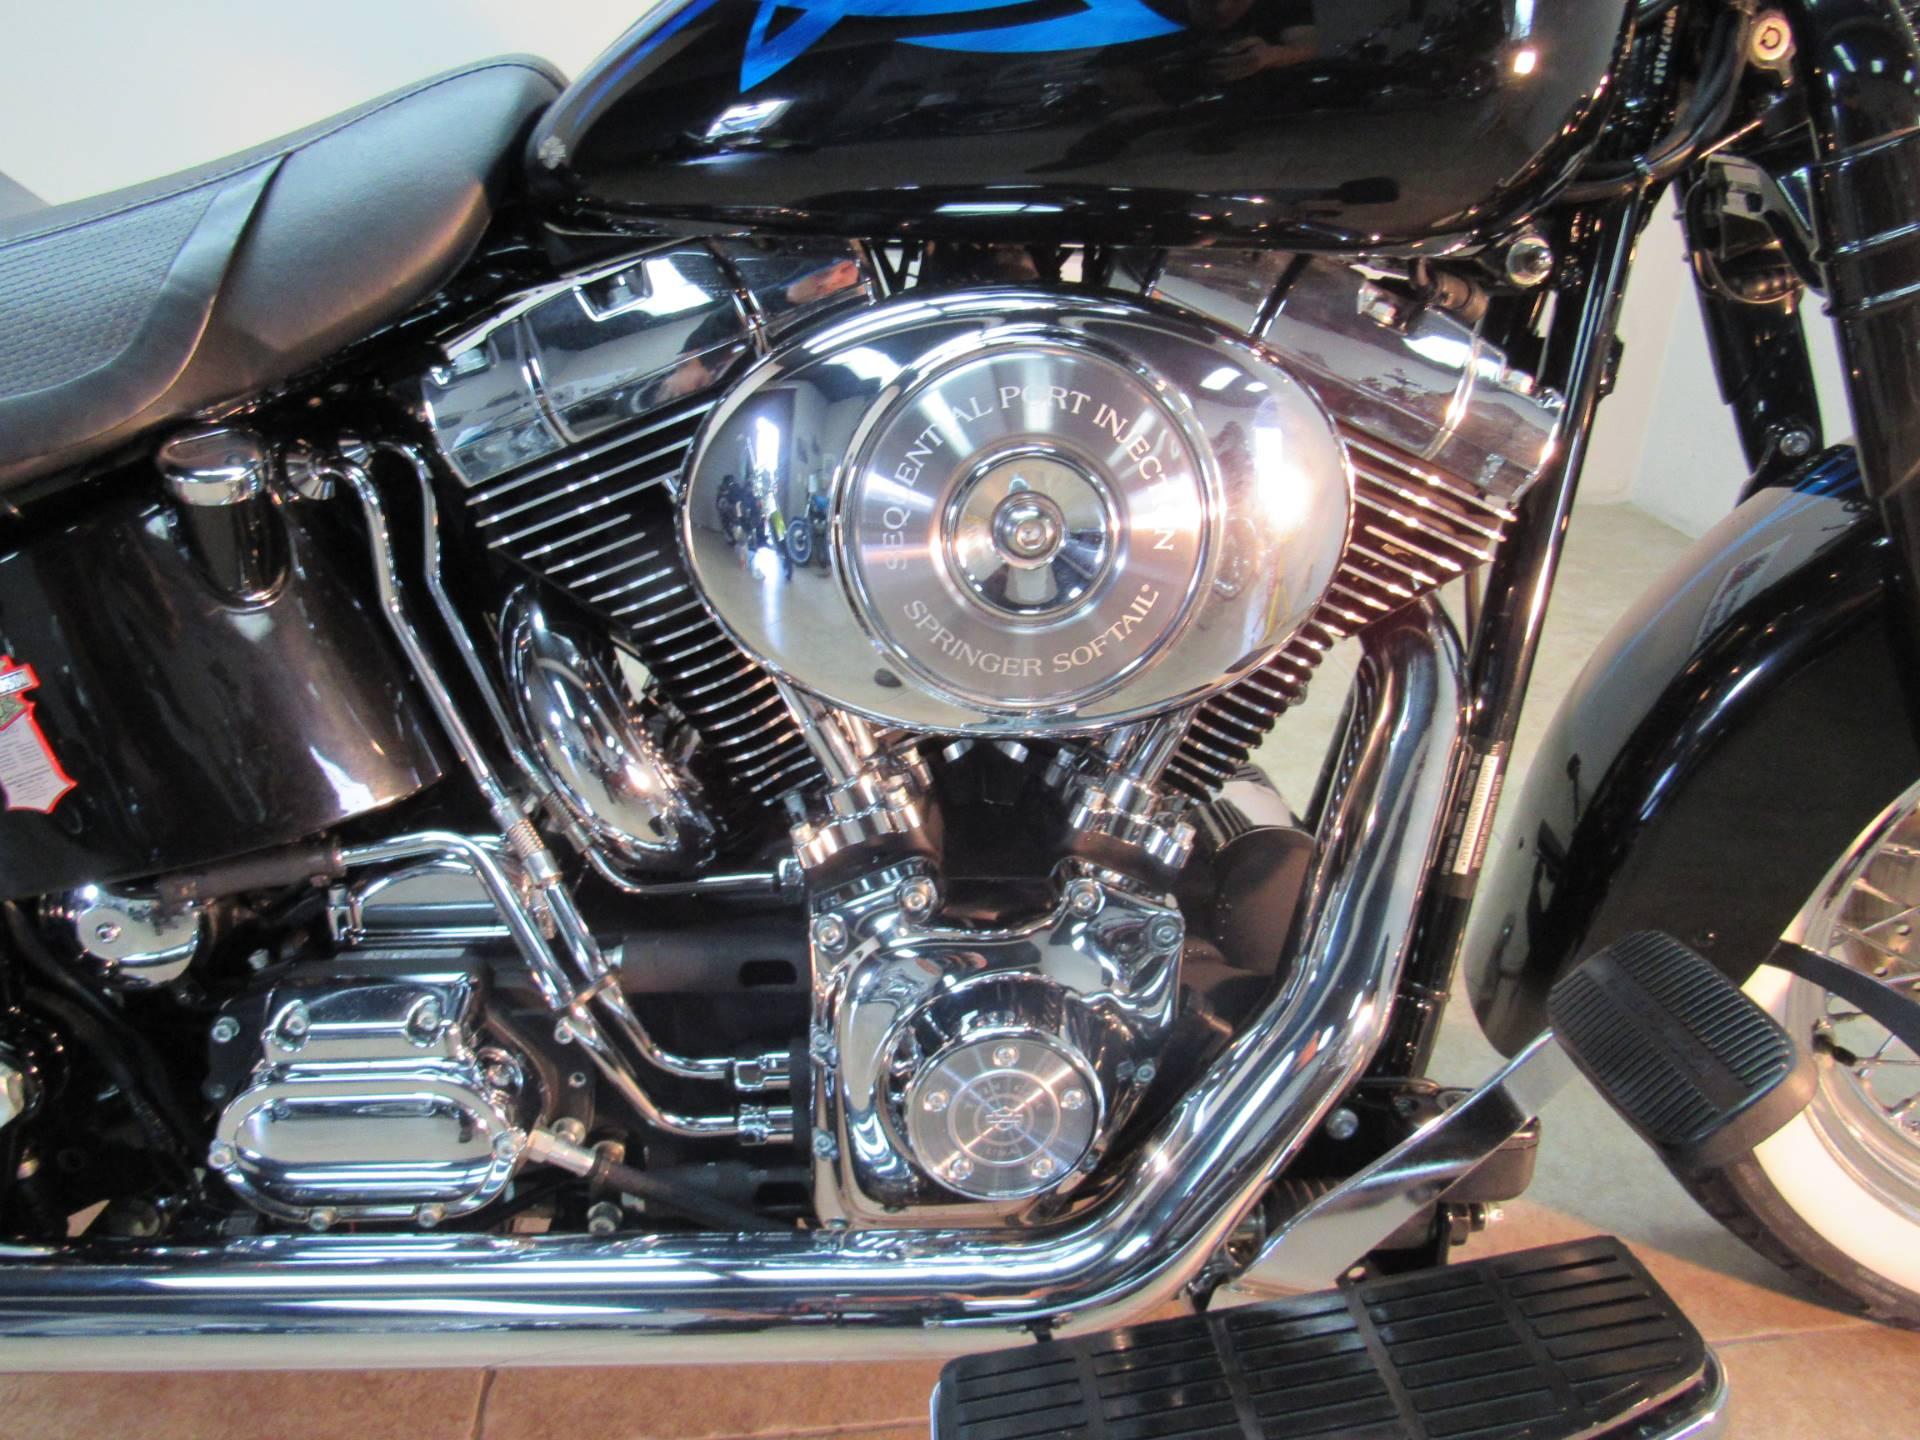 2005 Harley-Davidson FLSTSC/FLSTSCI Softail Springer Classic 6